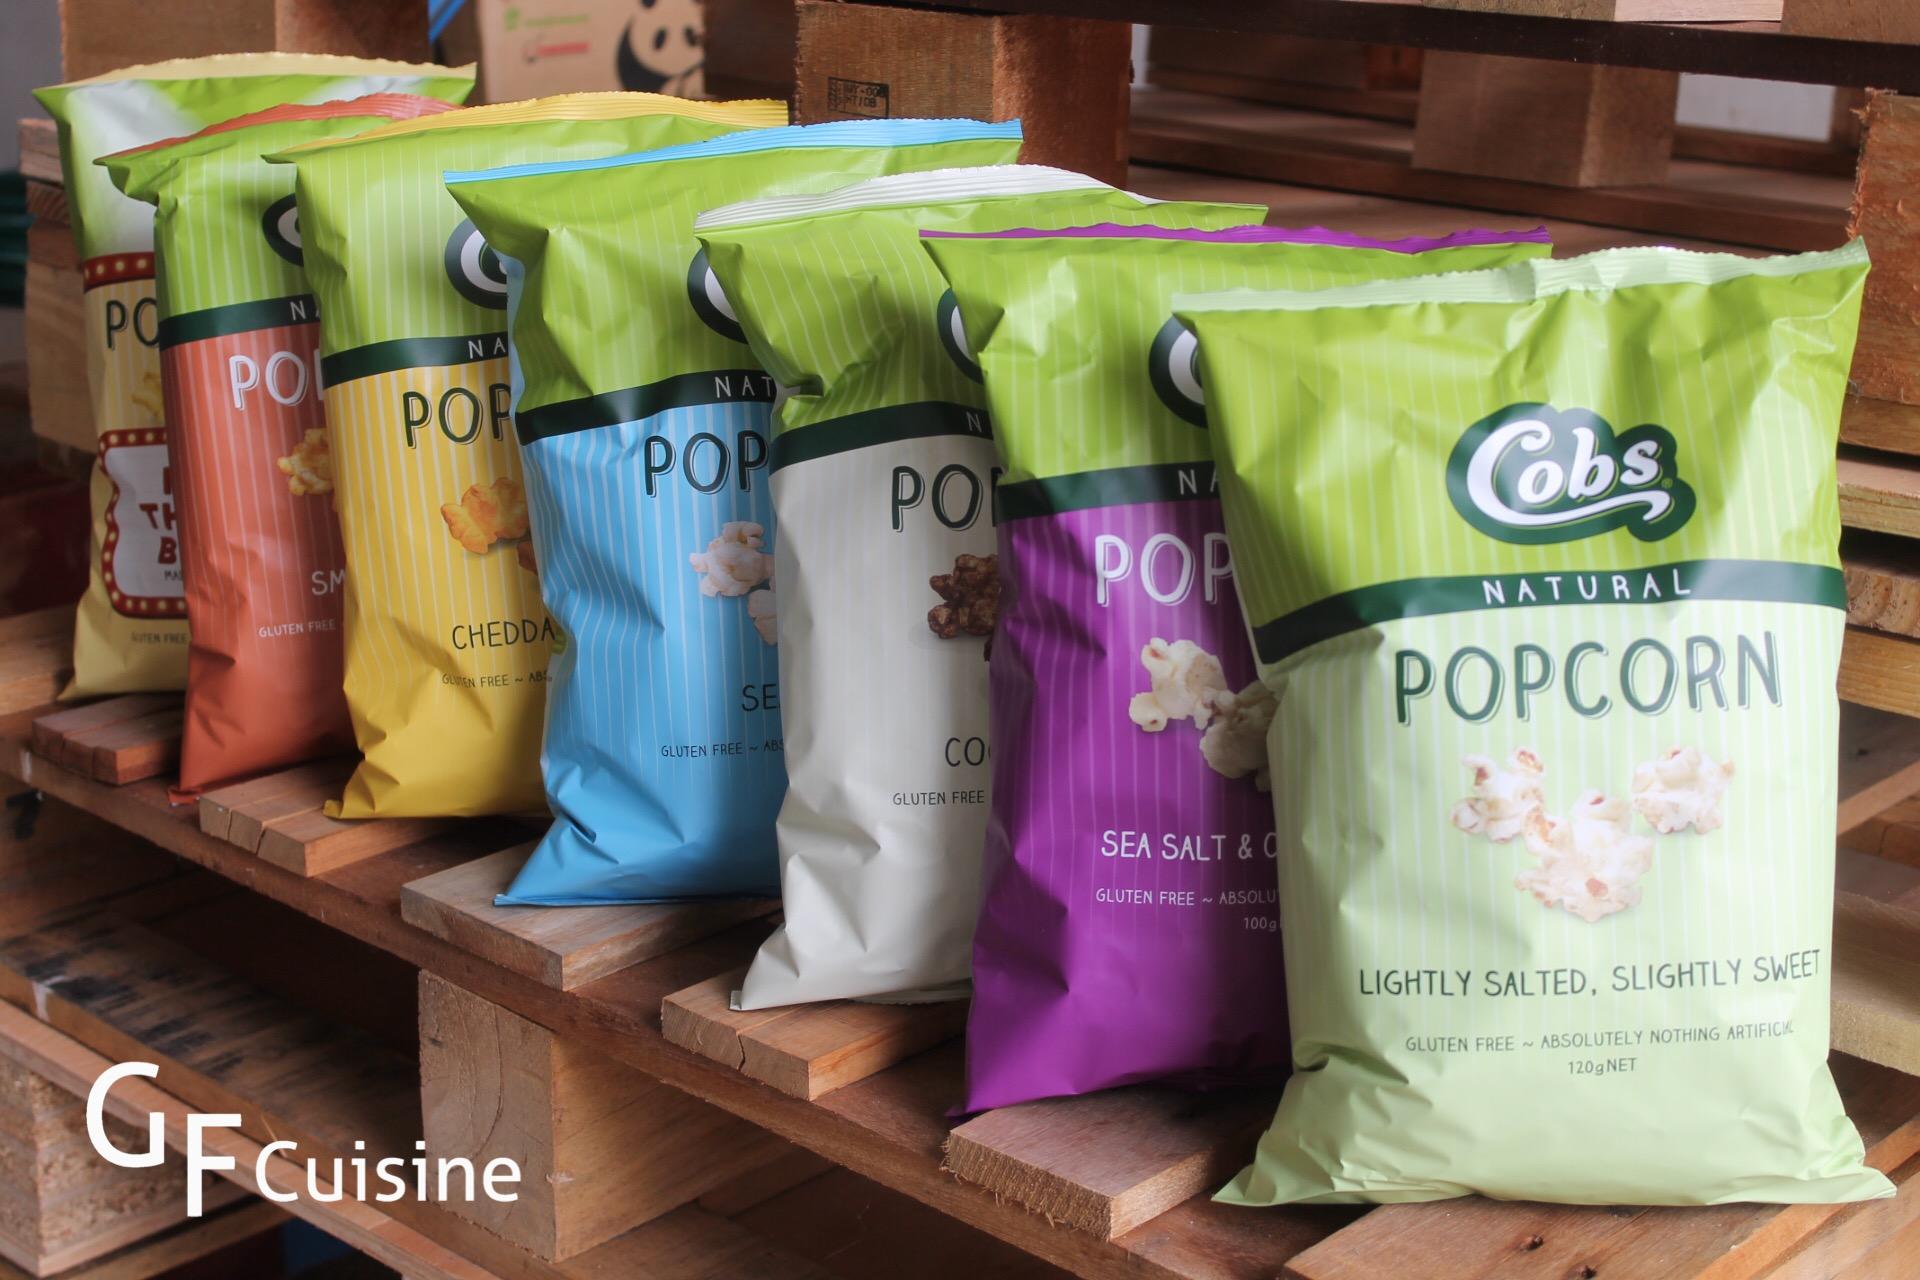 Cobs Popcorn Range